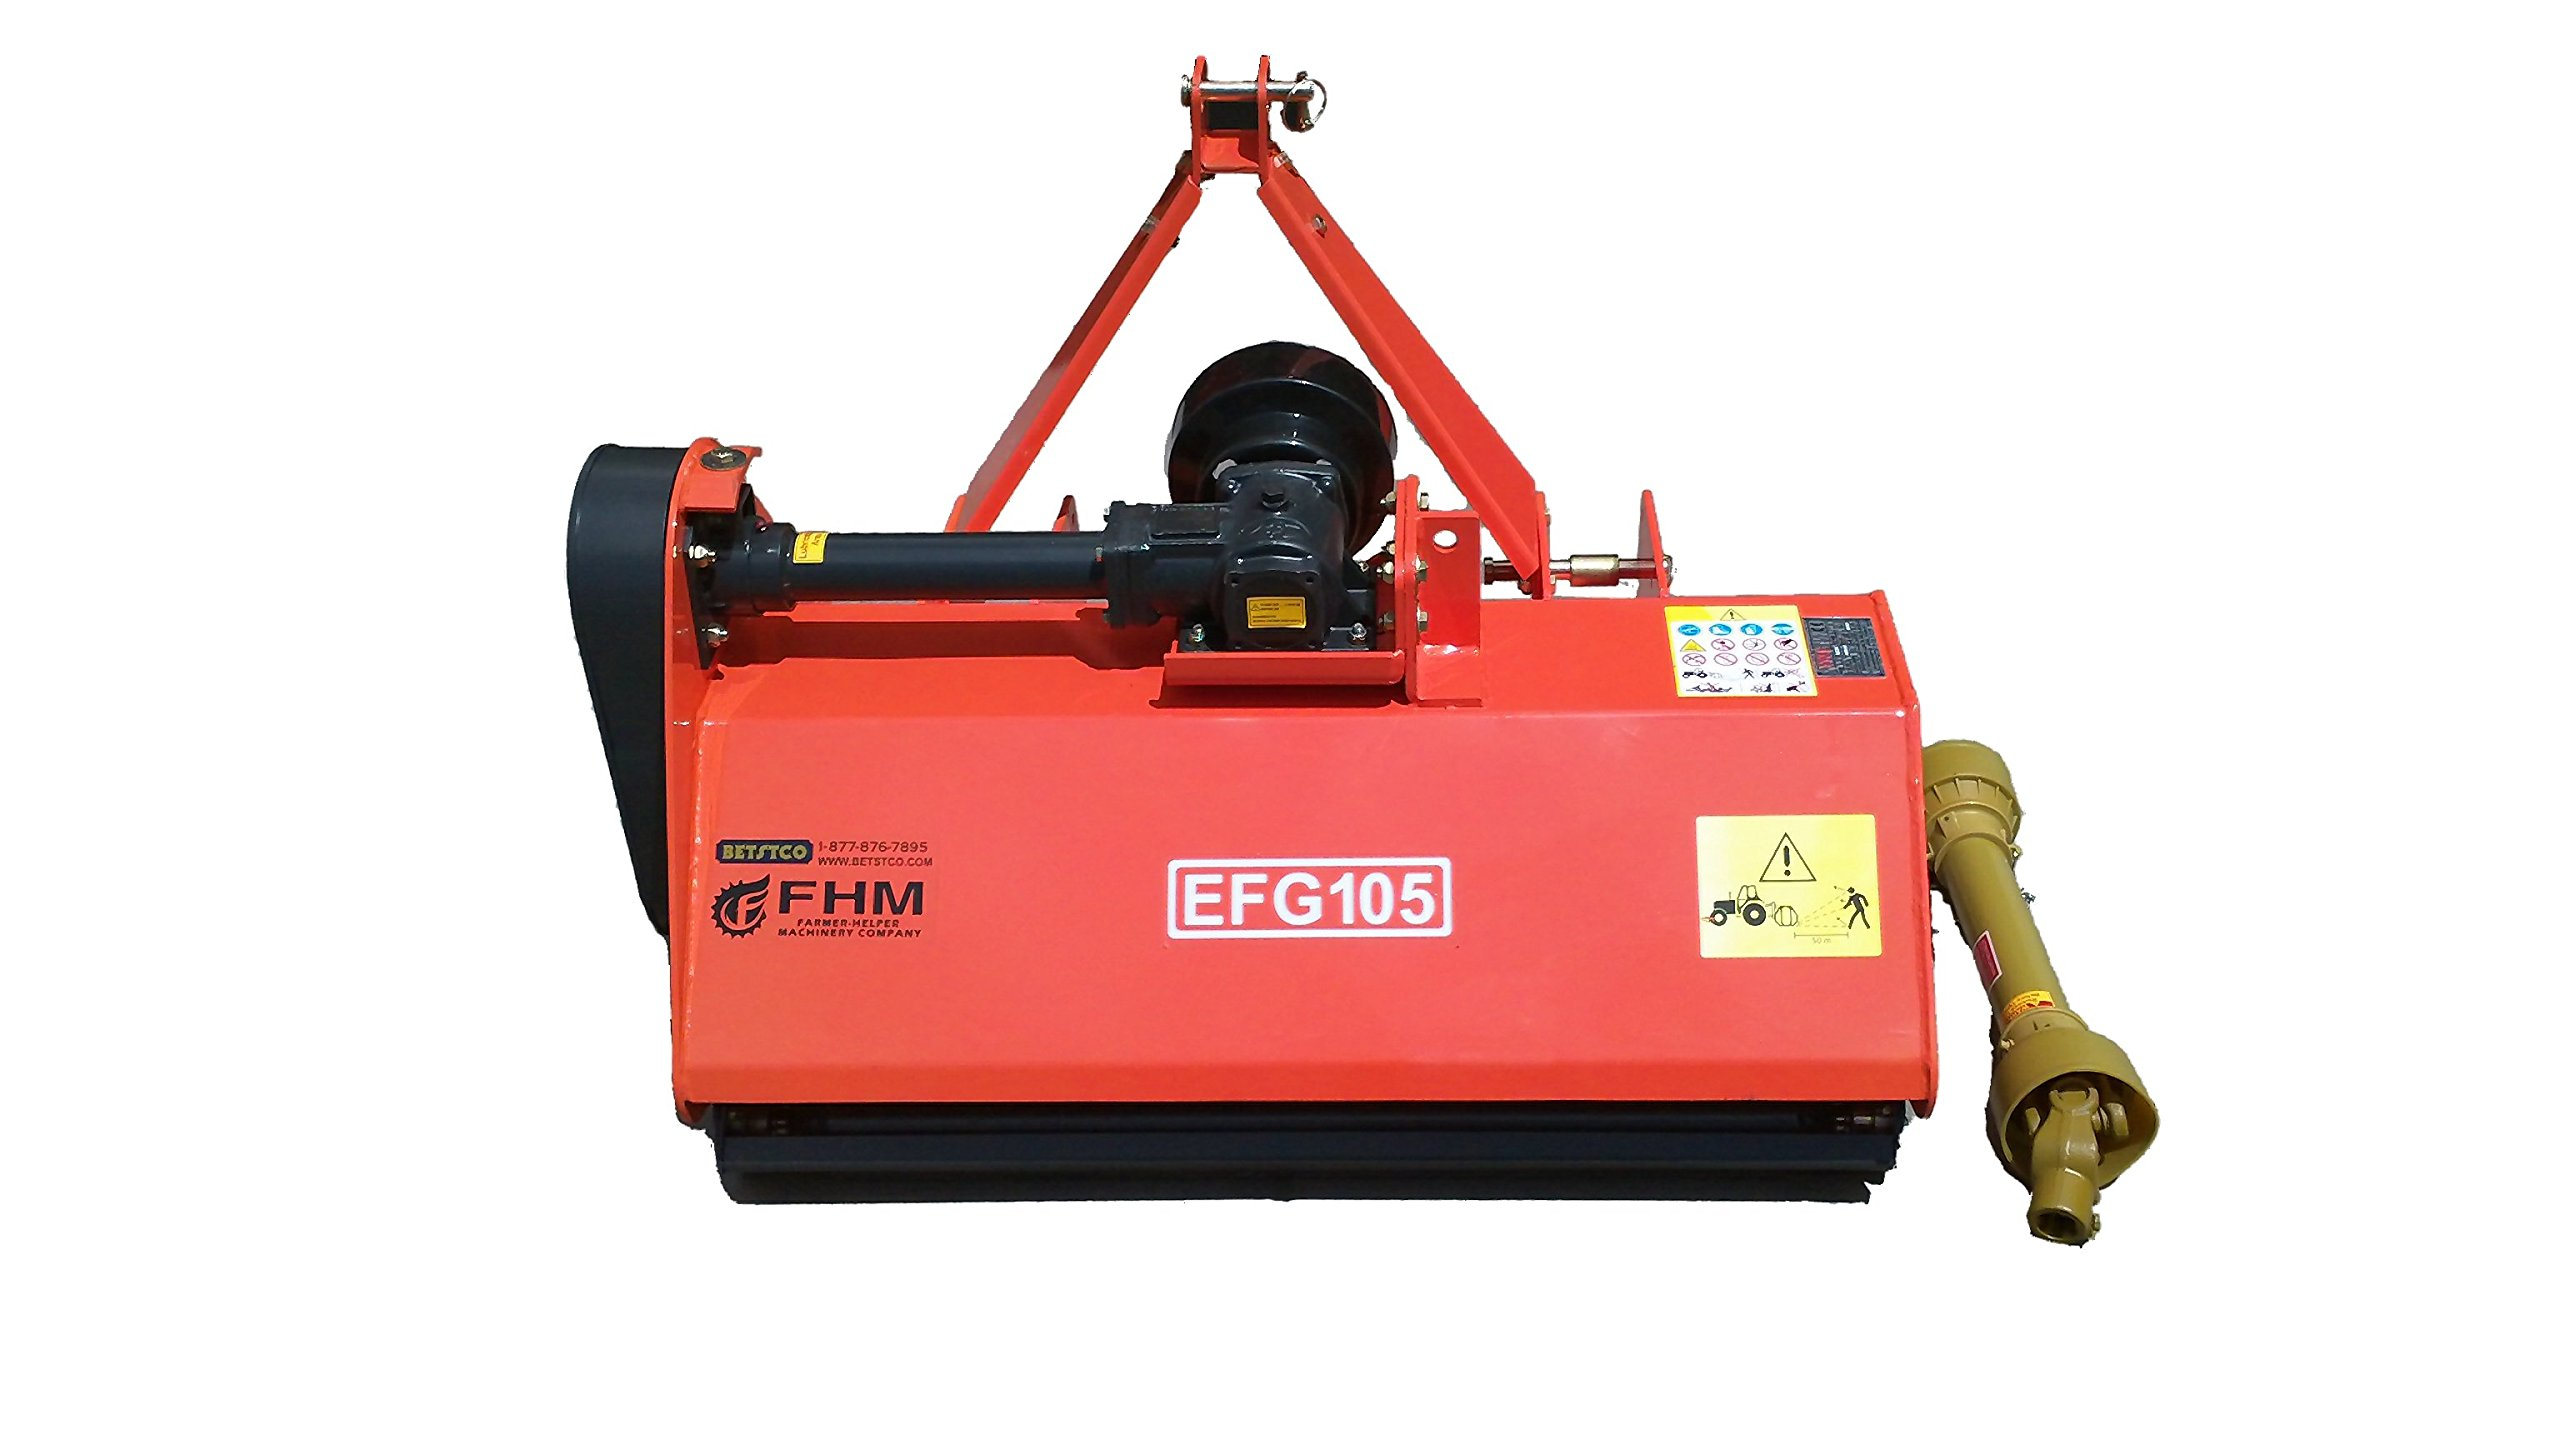 Farmer Helper 41'' Standard Multi-Duty Flail Mower Cat.I 3pt 18+HP Rating (FH-EFG105)